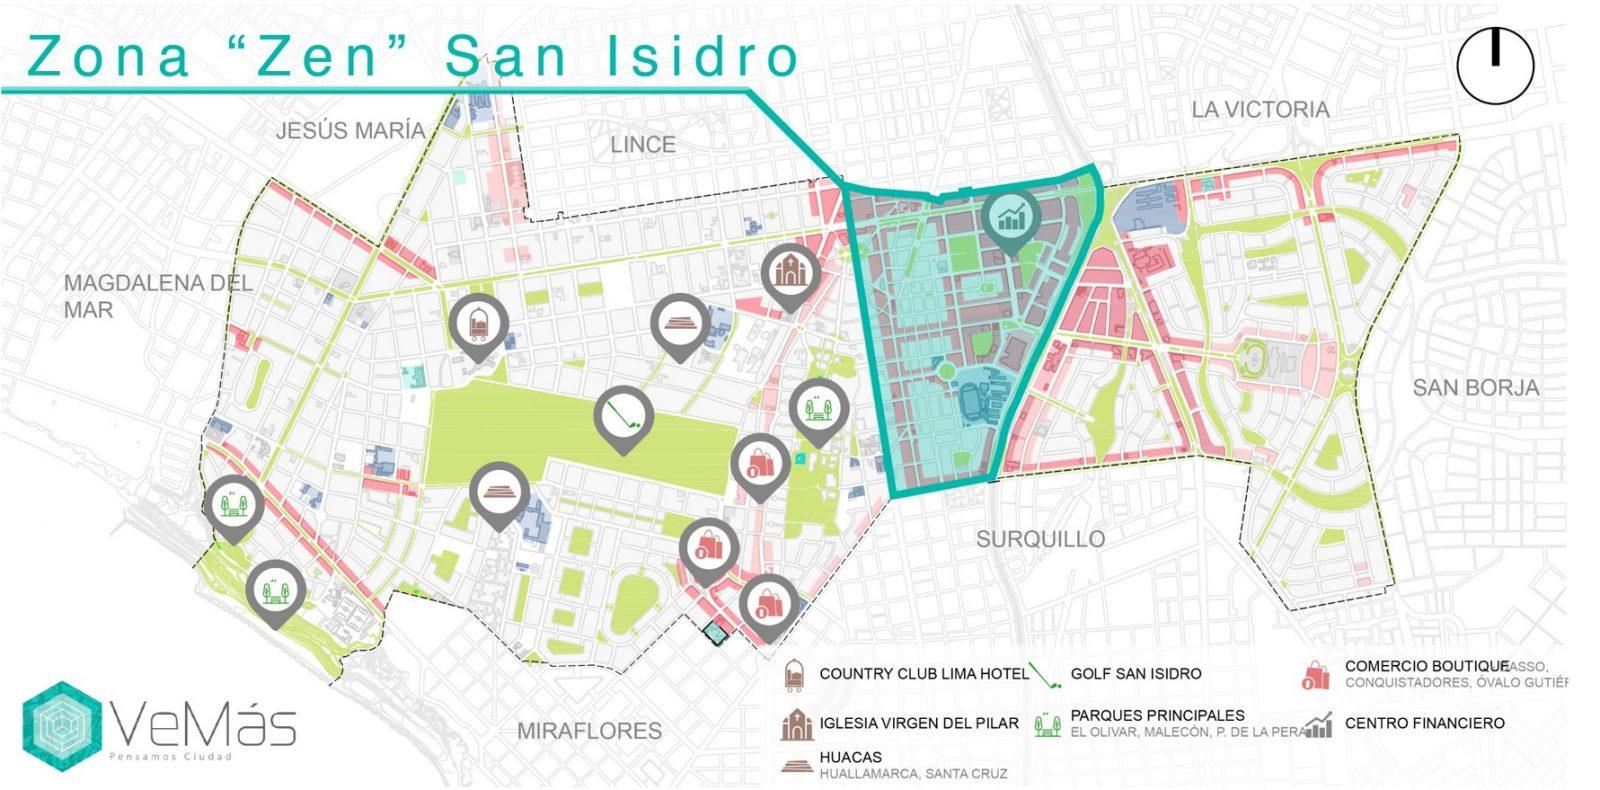 SAN ISIDRO Zona Zen